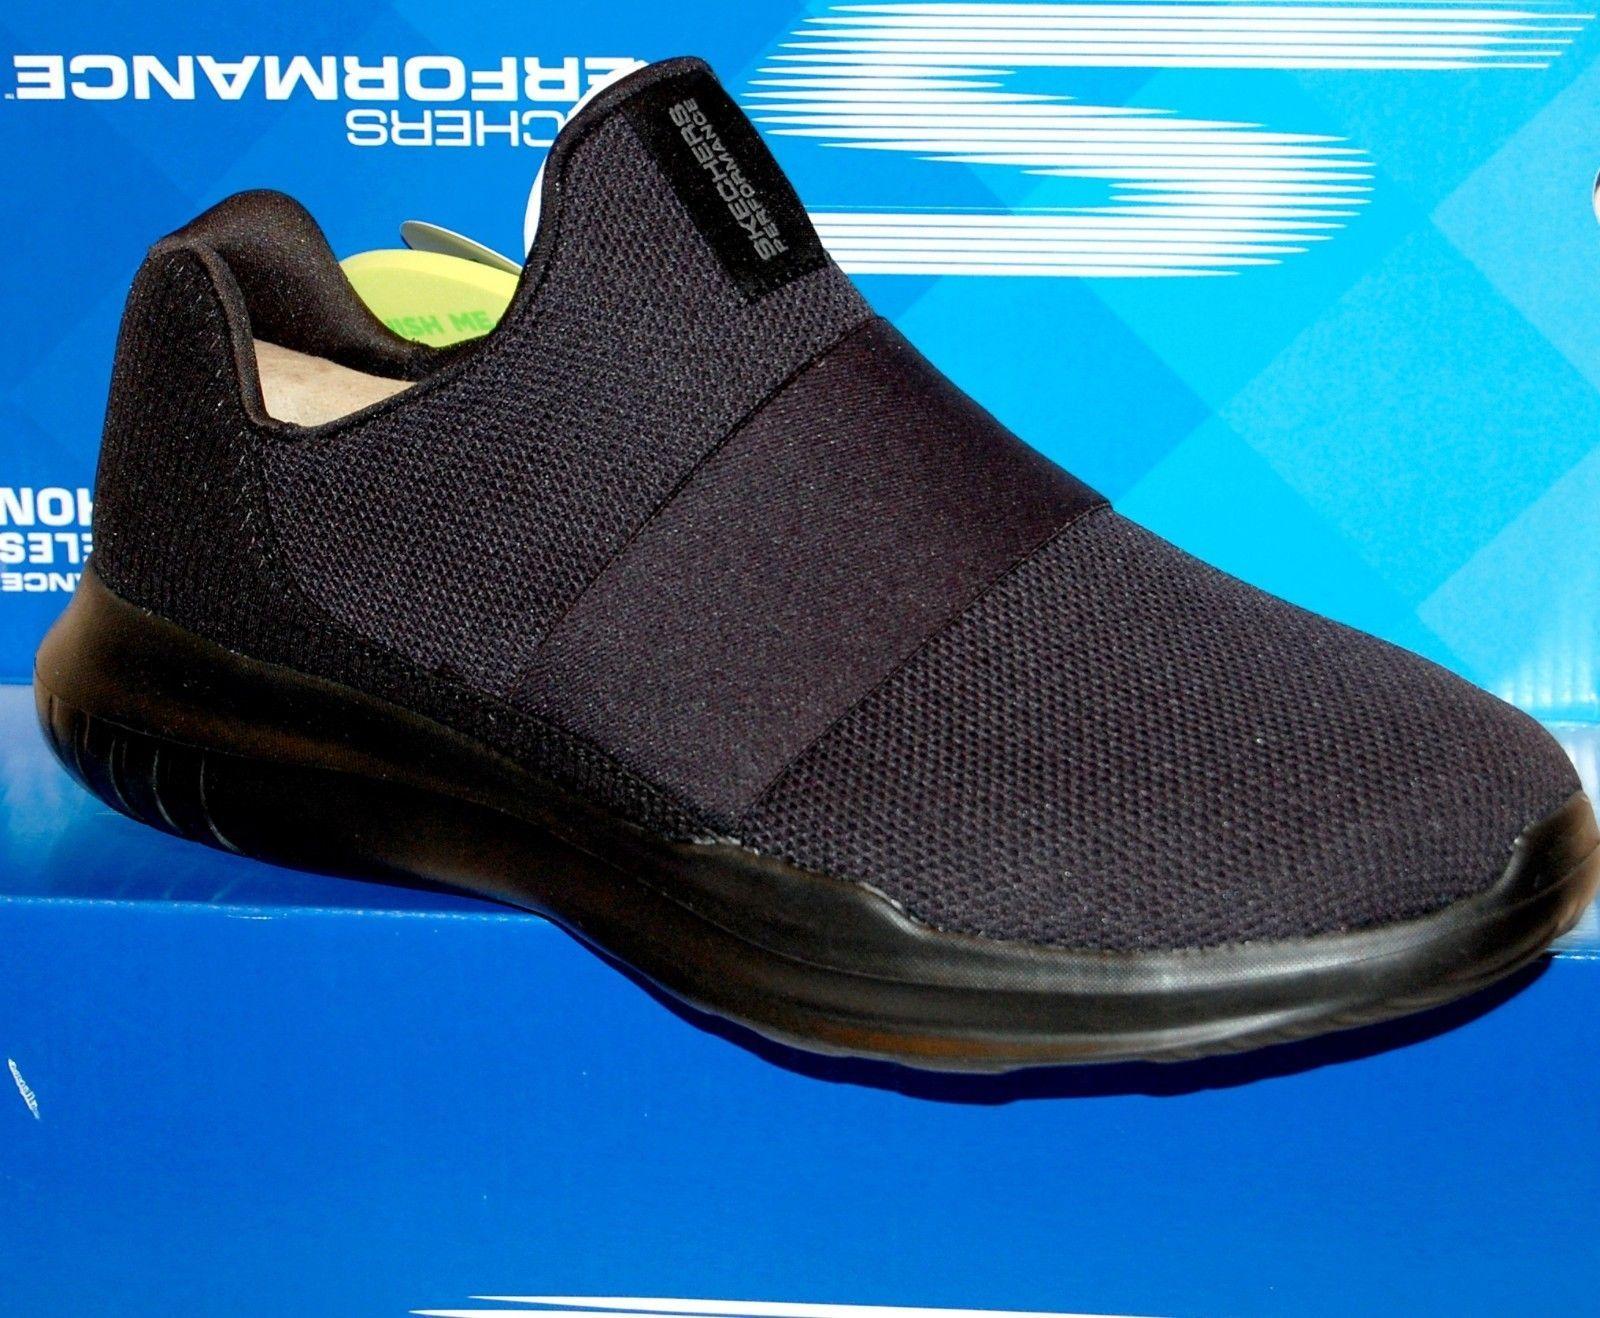 Skechers Go Run Mojo Mania Black Navy Men's  Slip Comfort Shoes Sneakers US 12